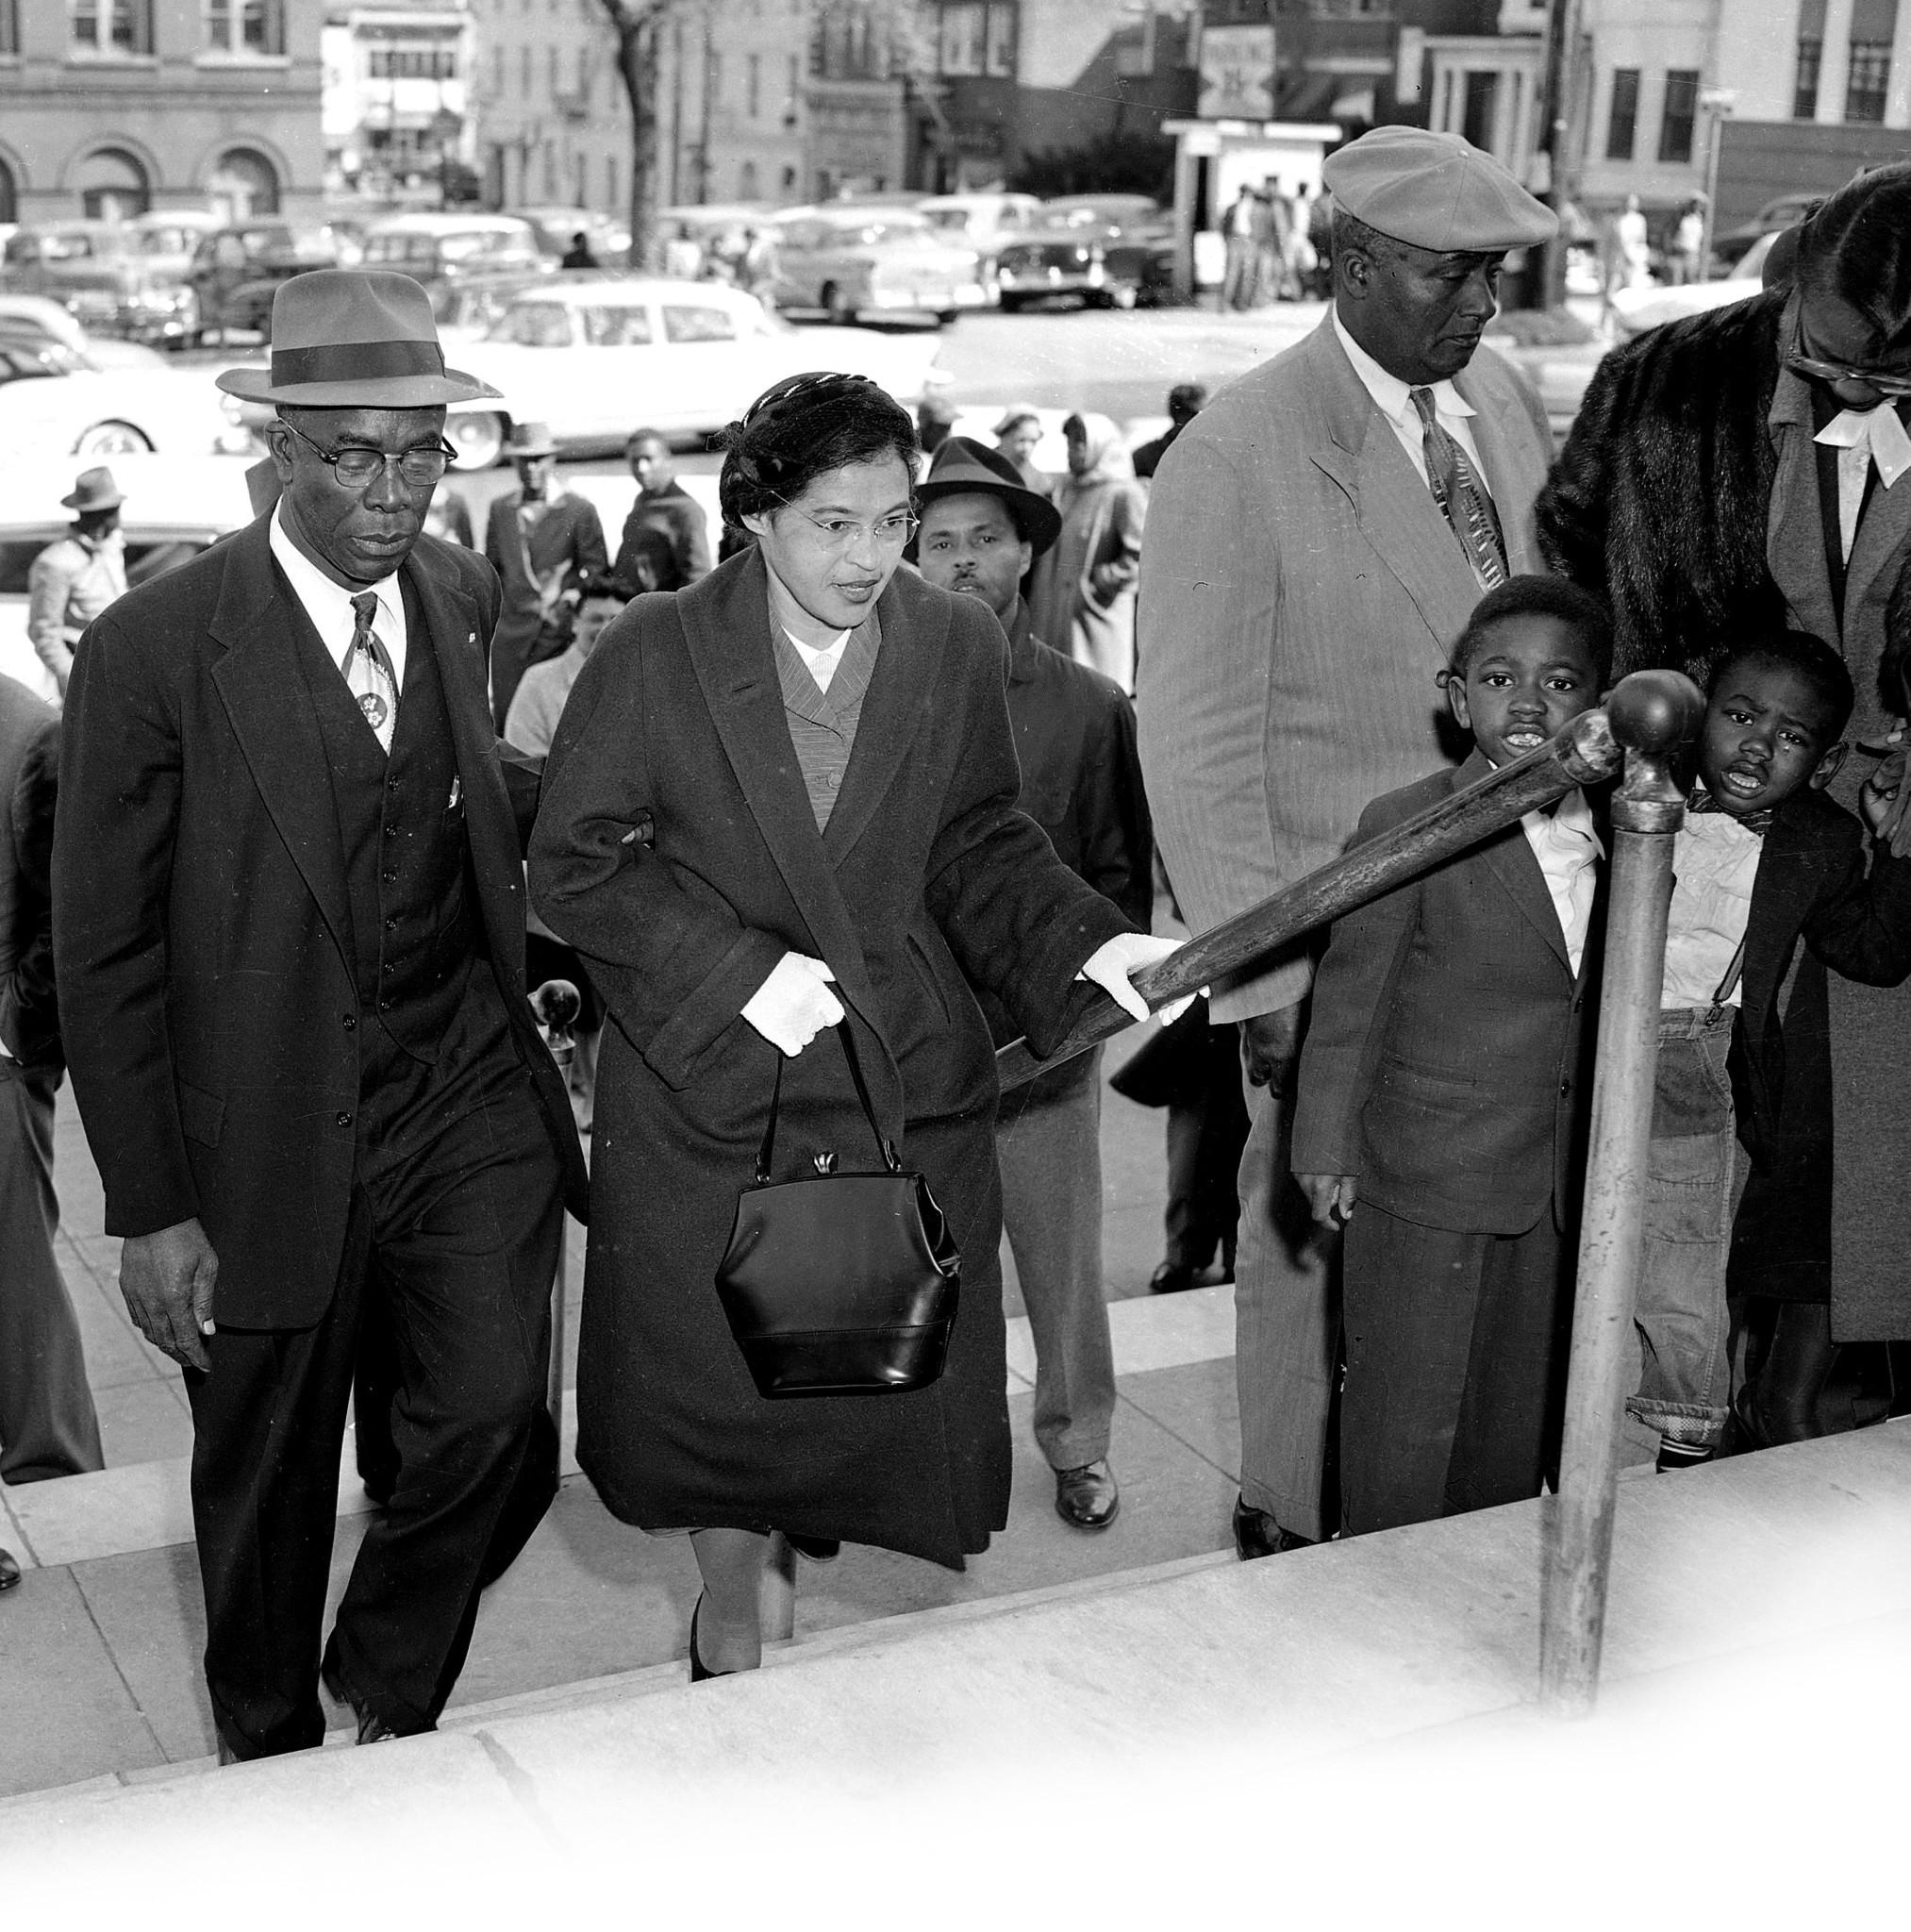 politicians blamed both sides during civil rights movement kkk